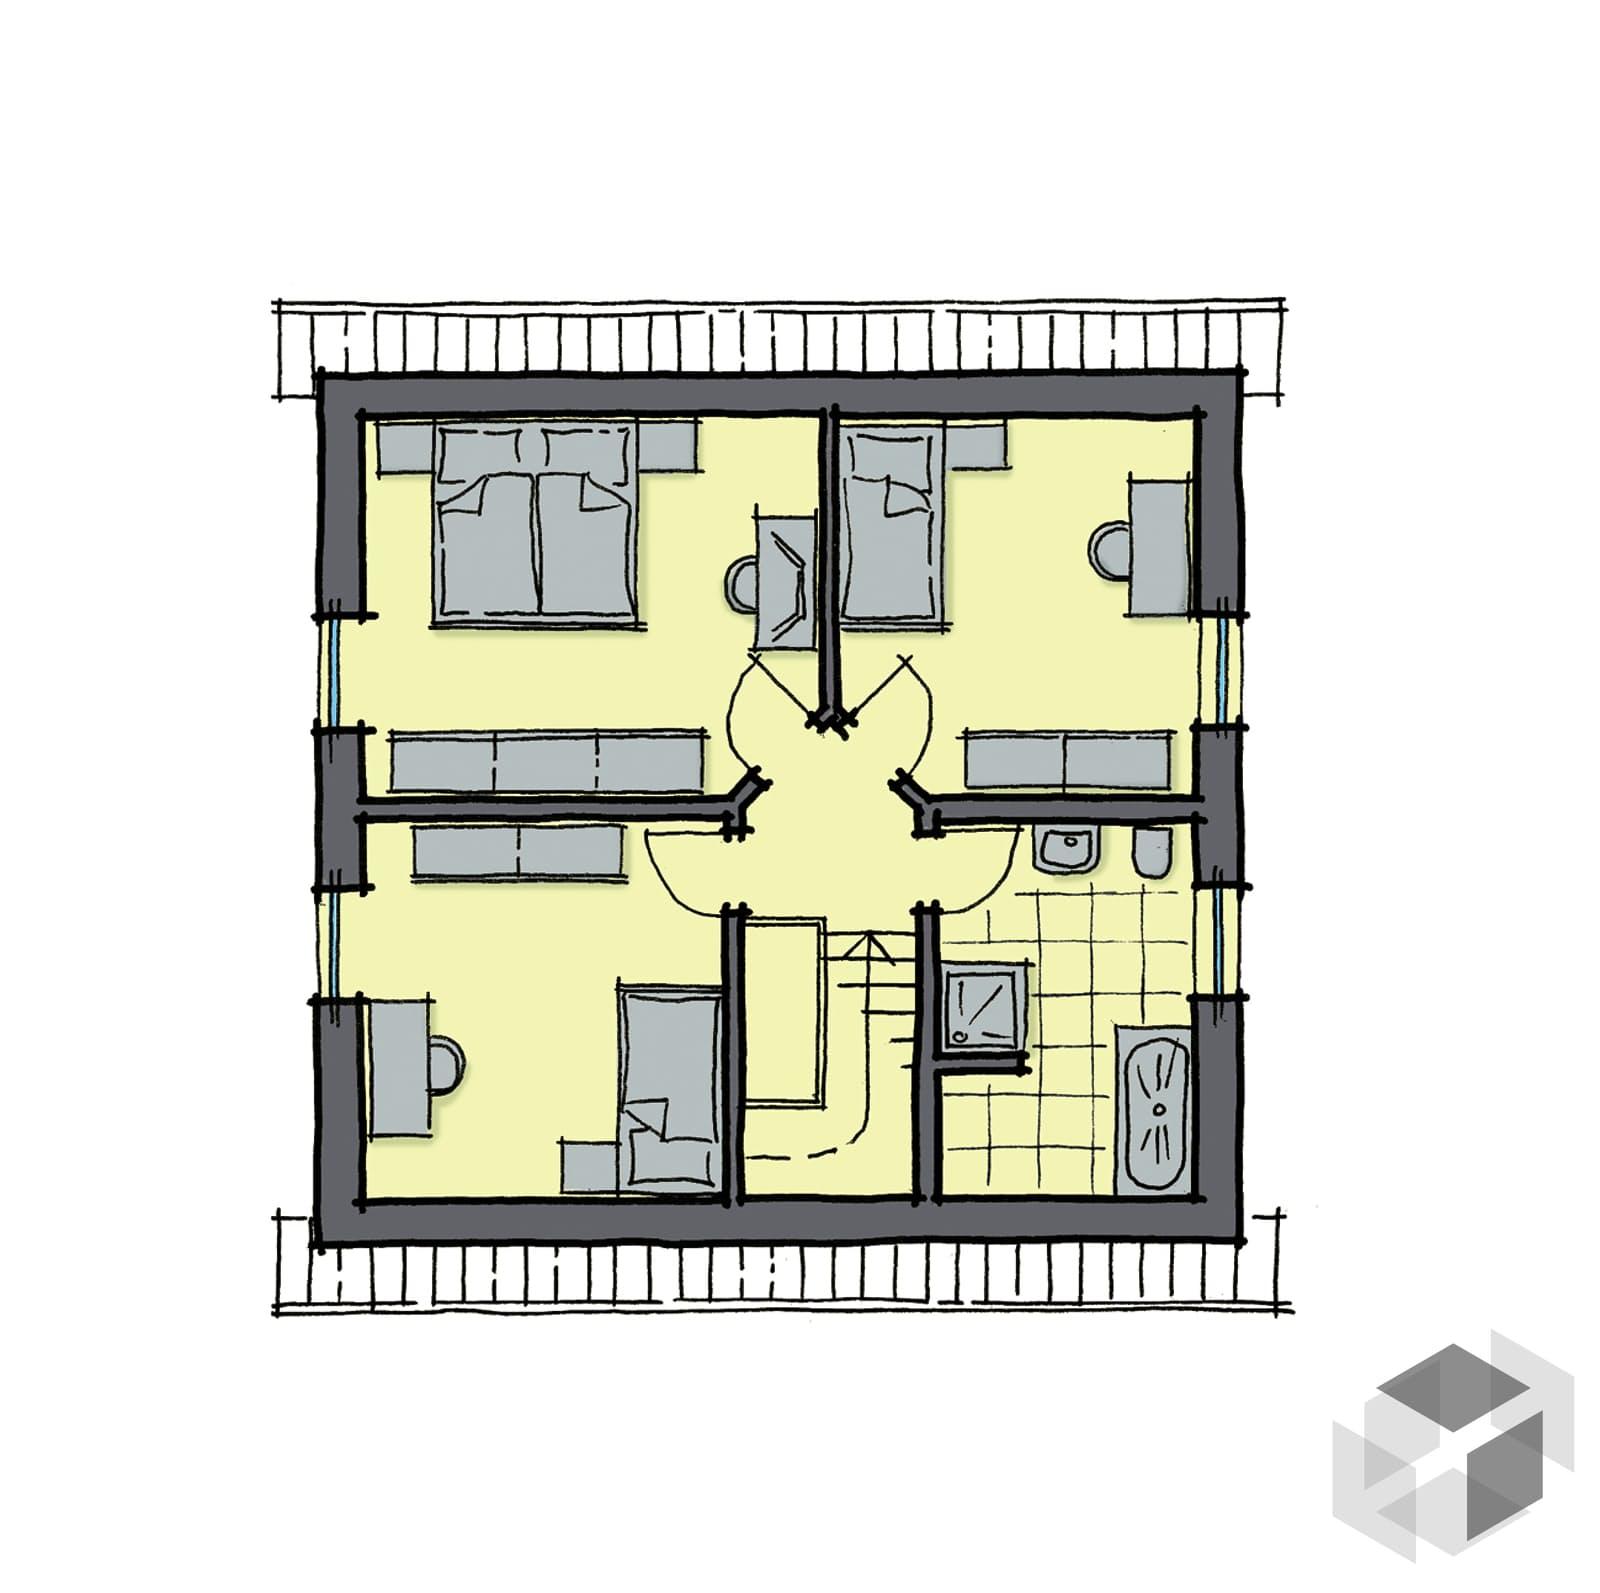 fliederallee von gussek haus komplette daten bersicht. Black Bedroom Furniture Sets. Home Design Ideas